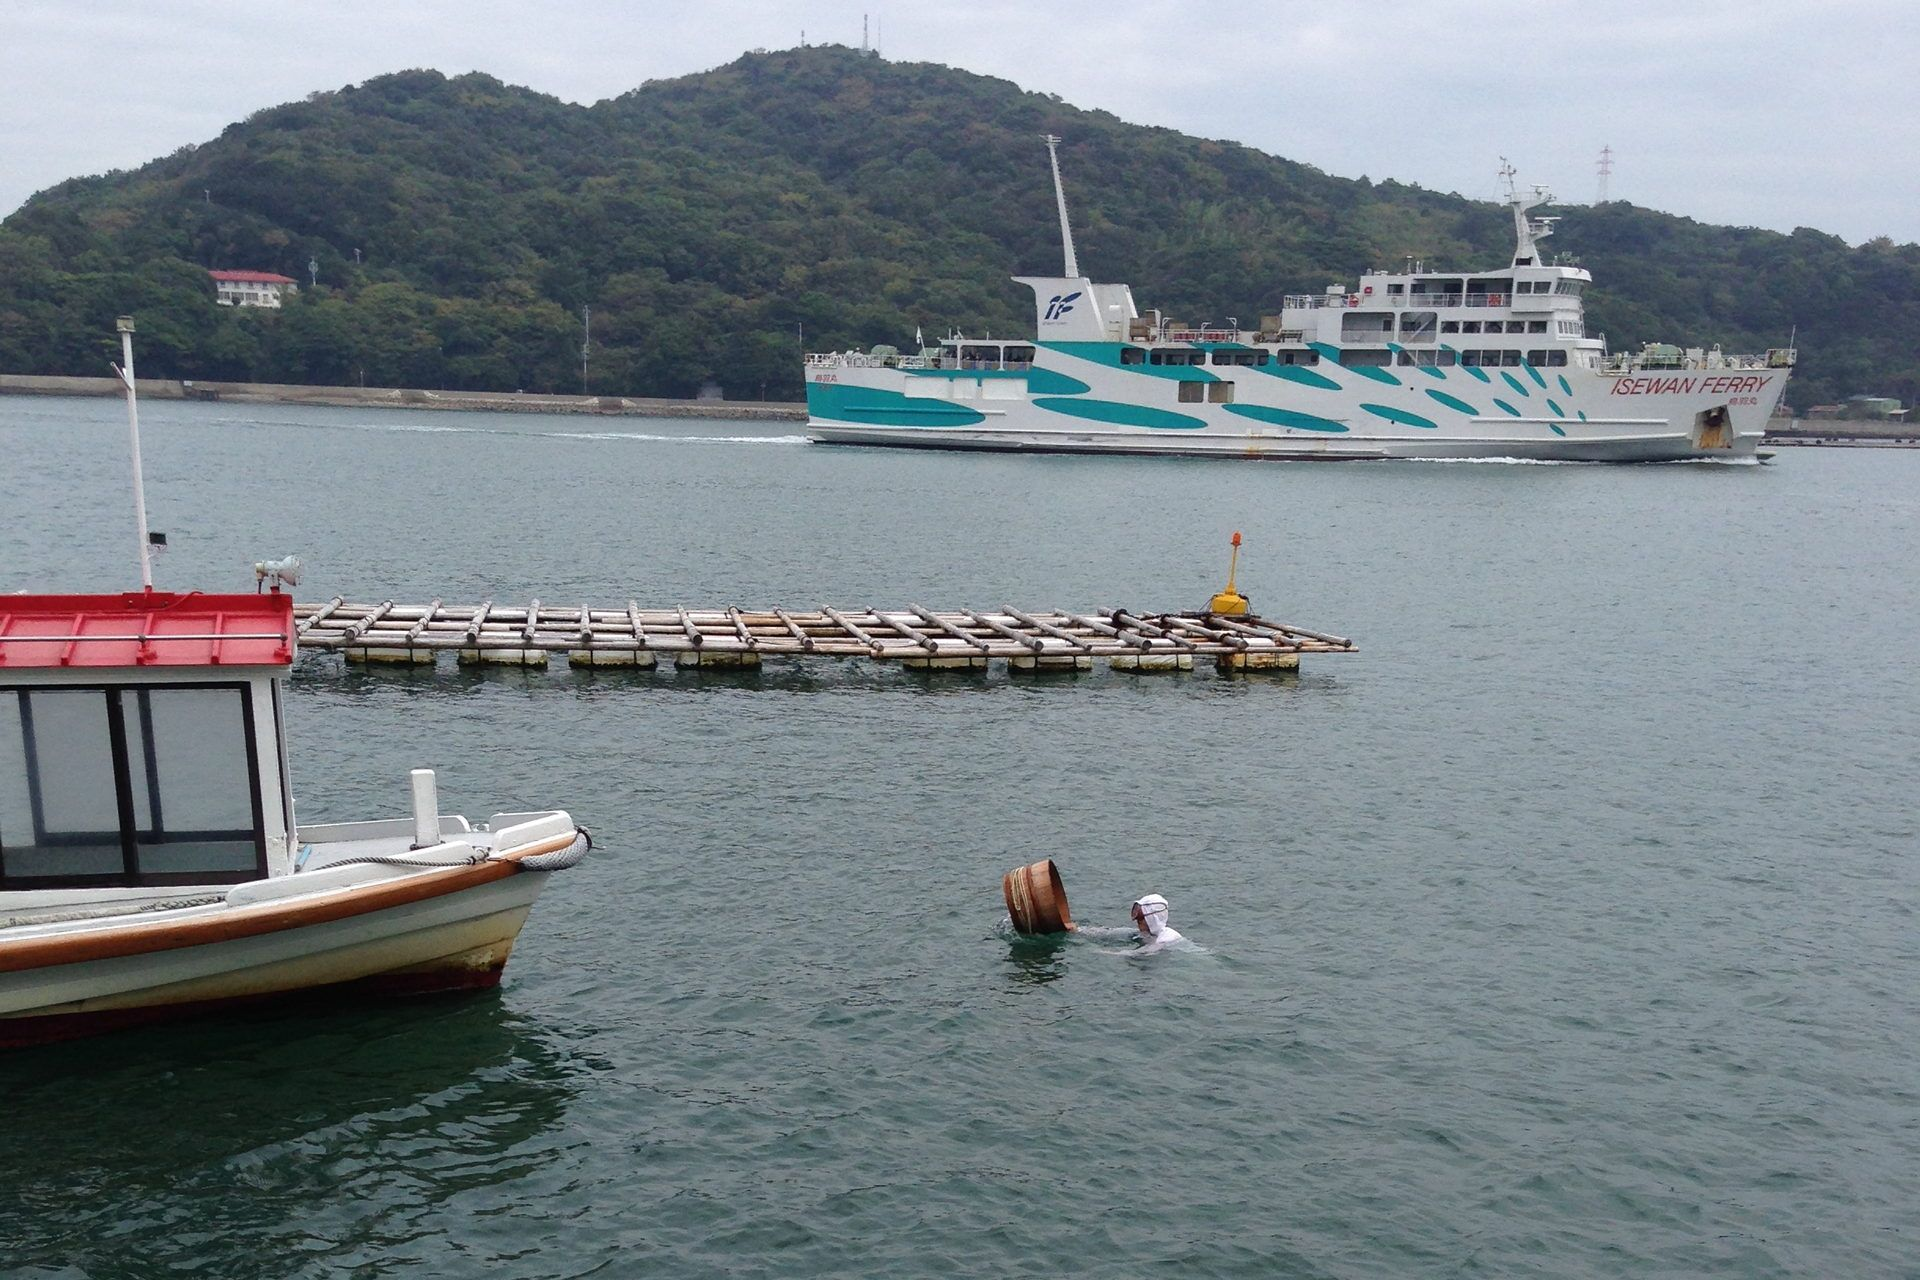 Mikimoto Pearl Island | Toba / Shima | Japan Travel Guide - Japan Hoppers